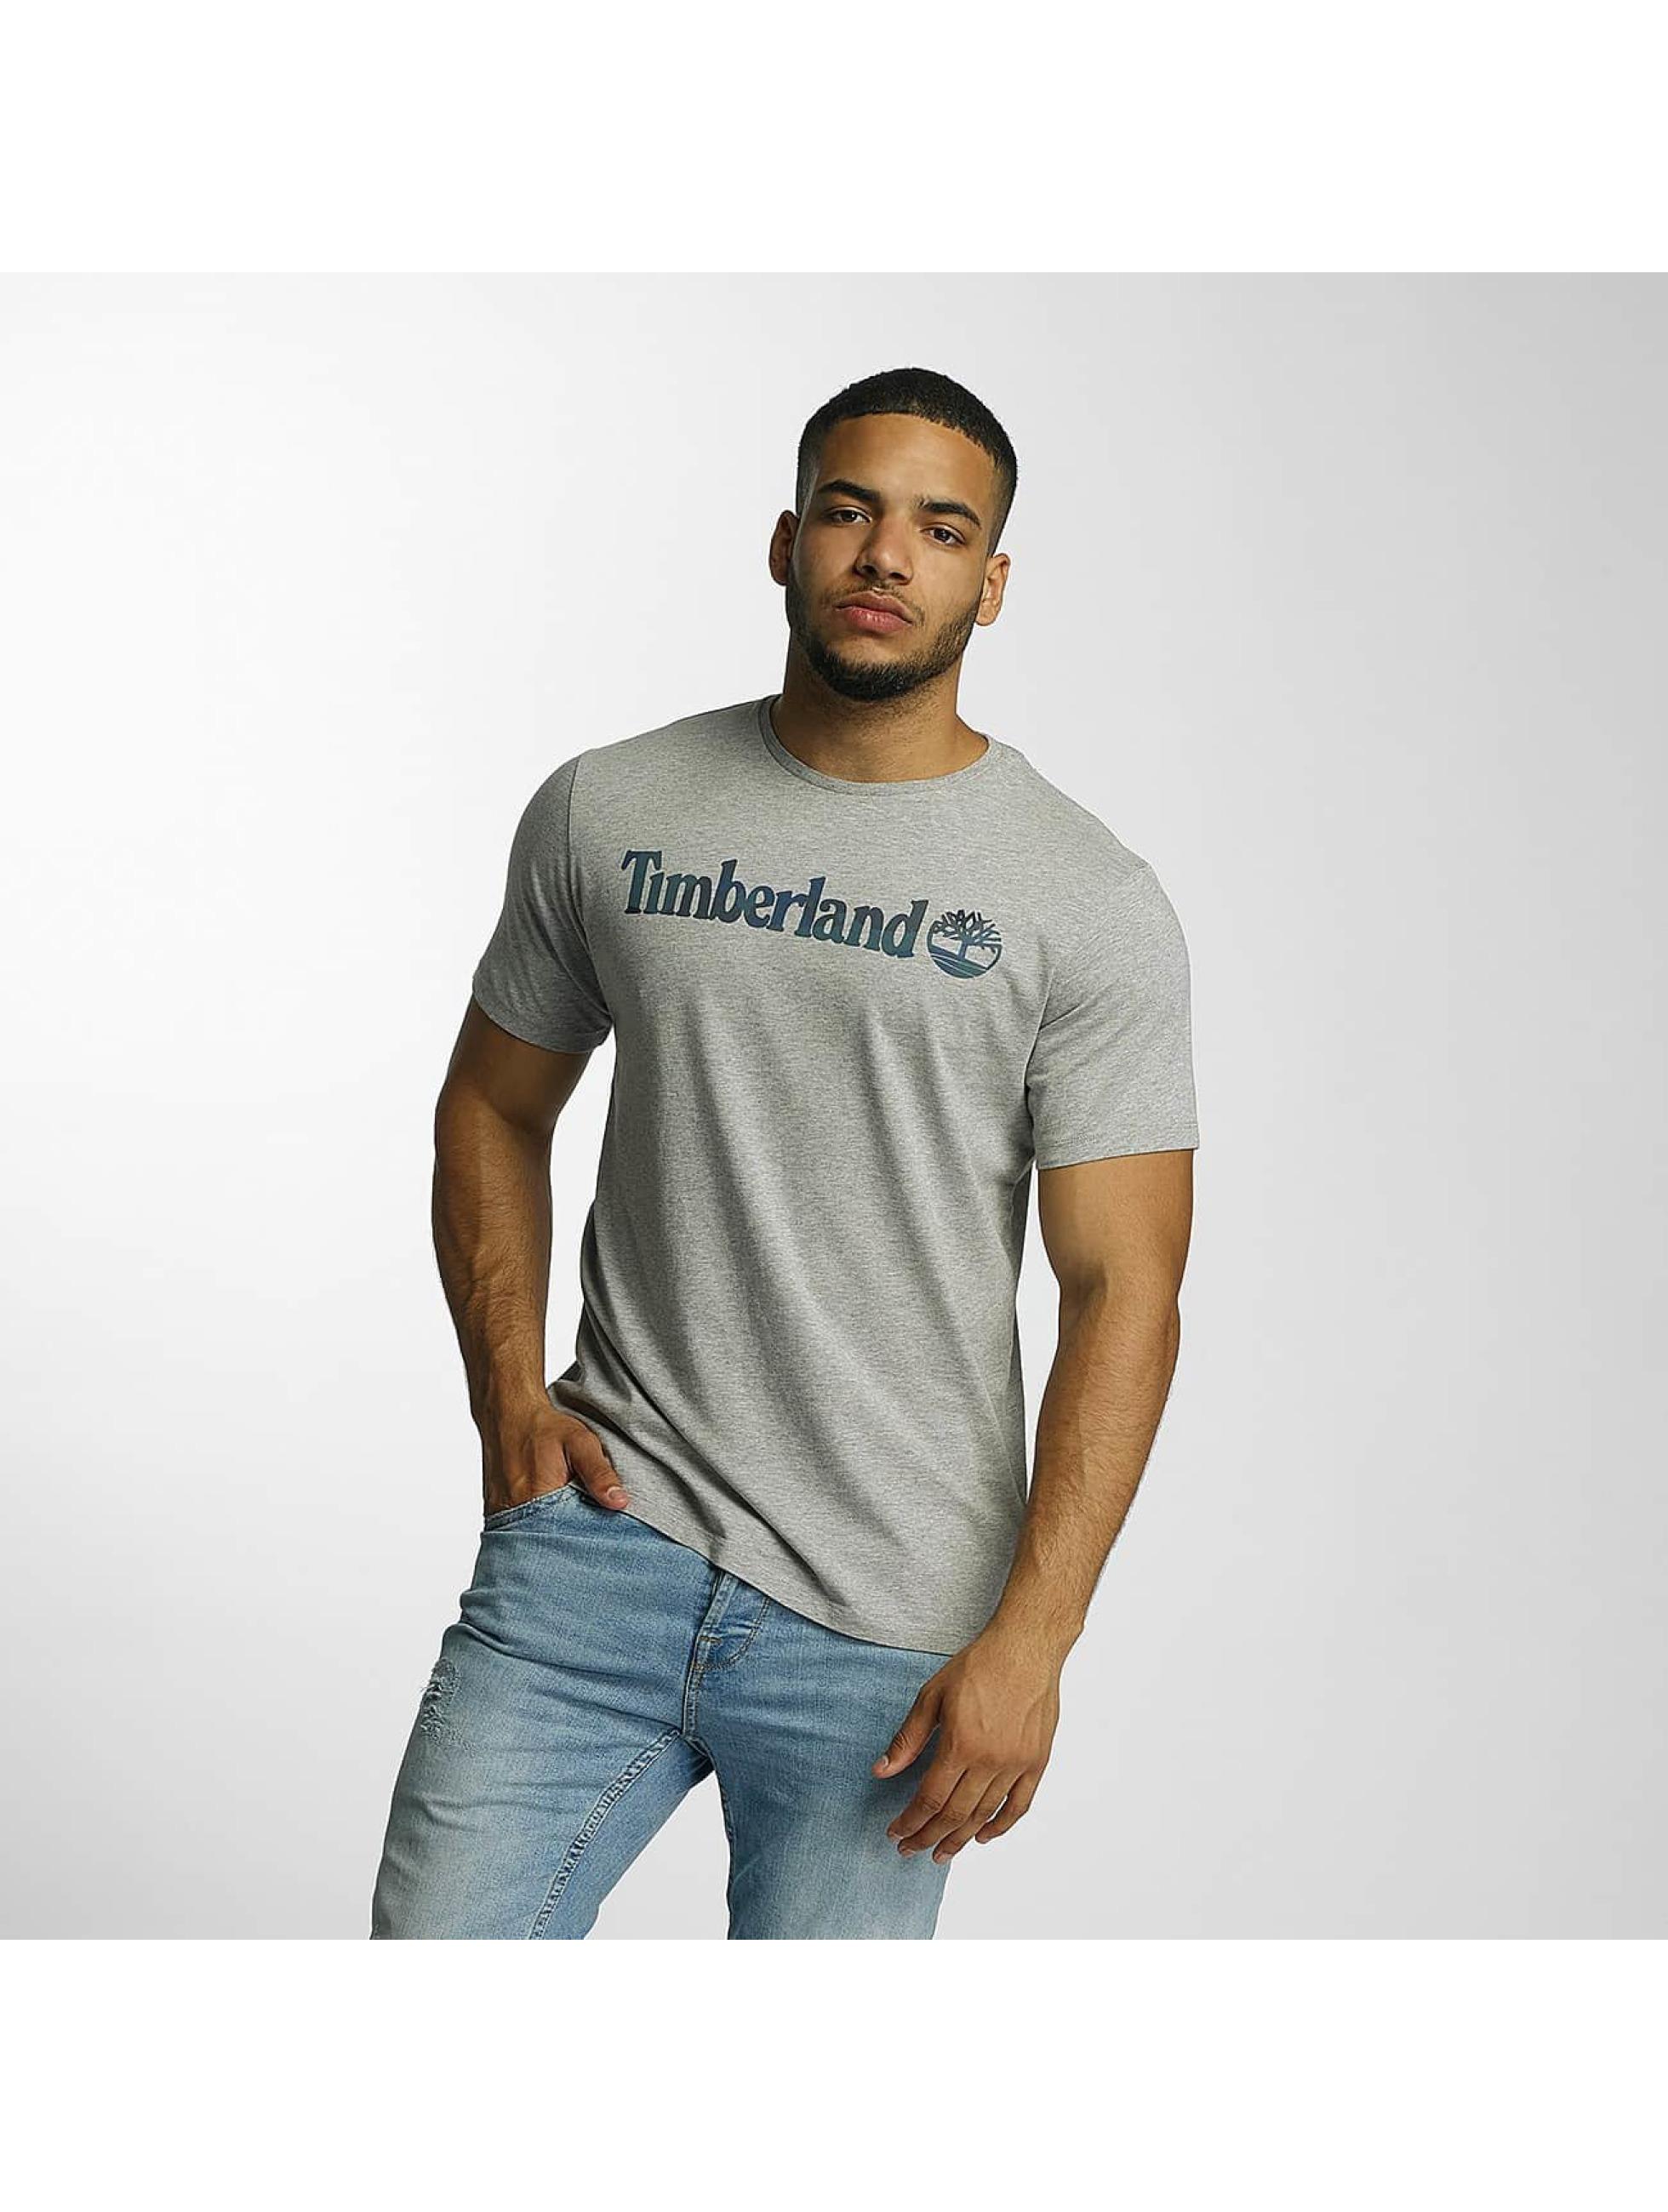 Timberland T-skjorter Dustan River Camo Print grå